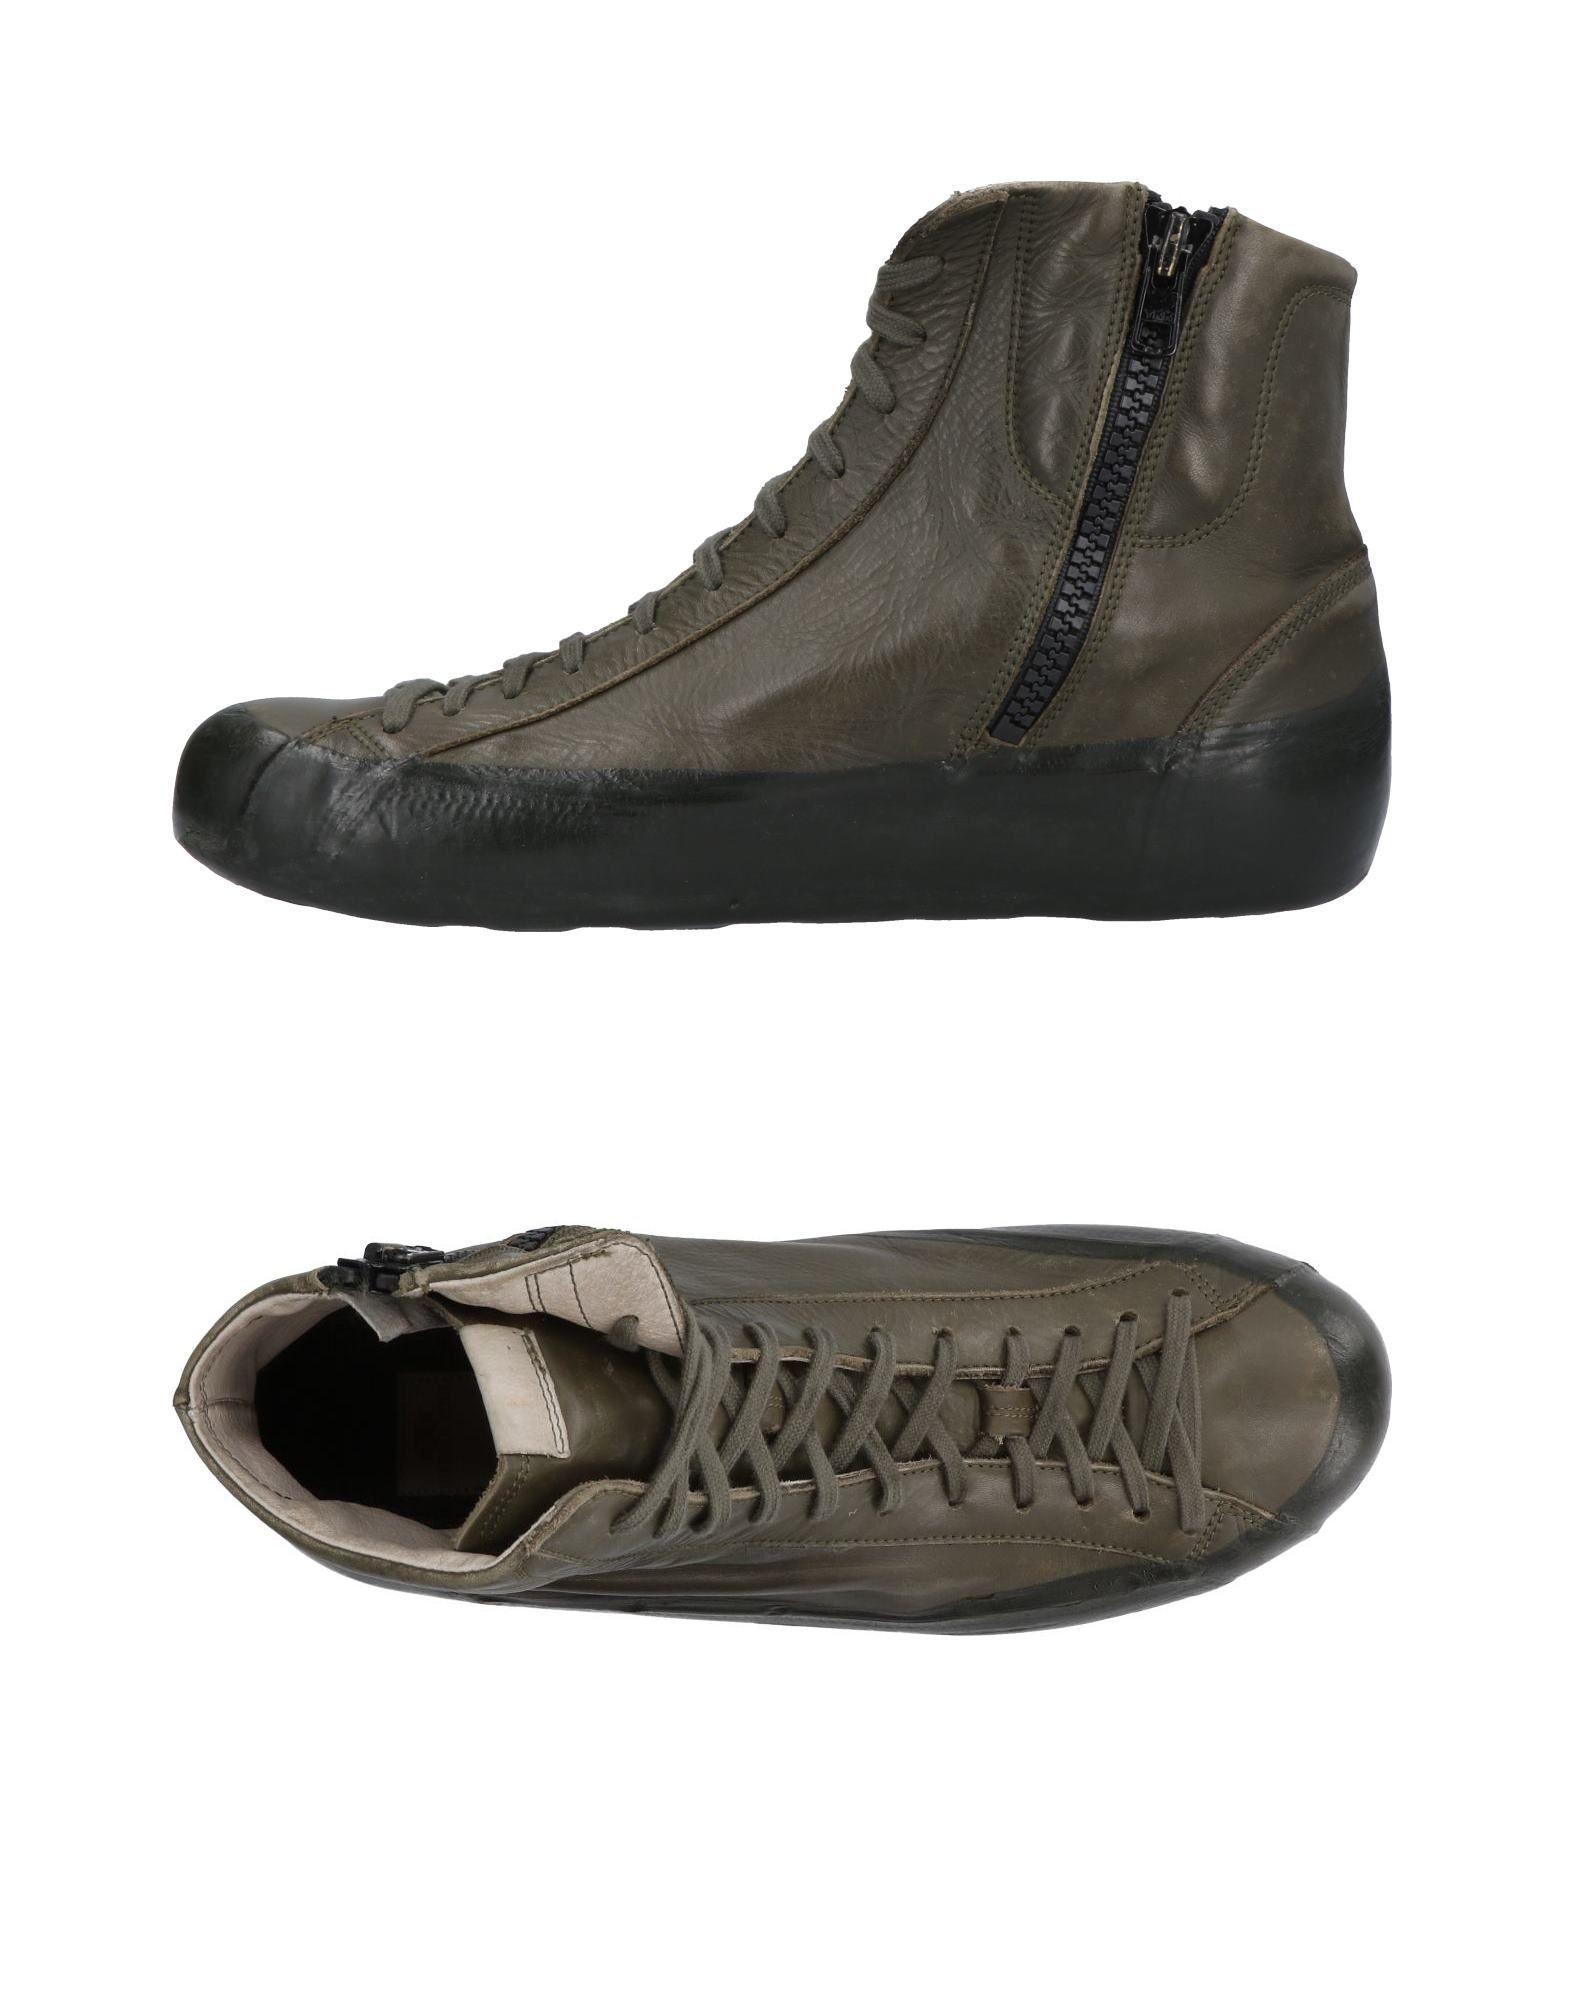 O.X.S. RUBBER SOUL Высокие кеды и кроссовки rubber dan высокие кеды и кроссовки